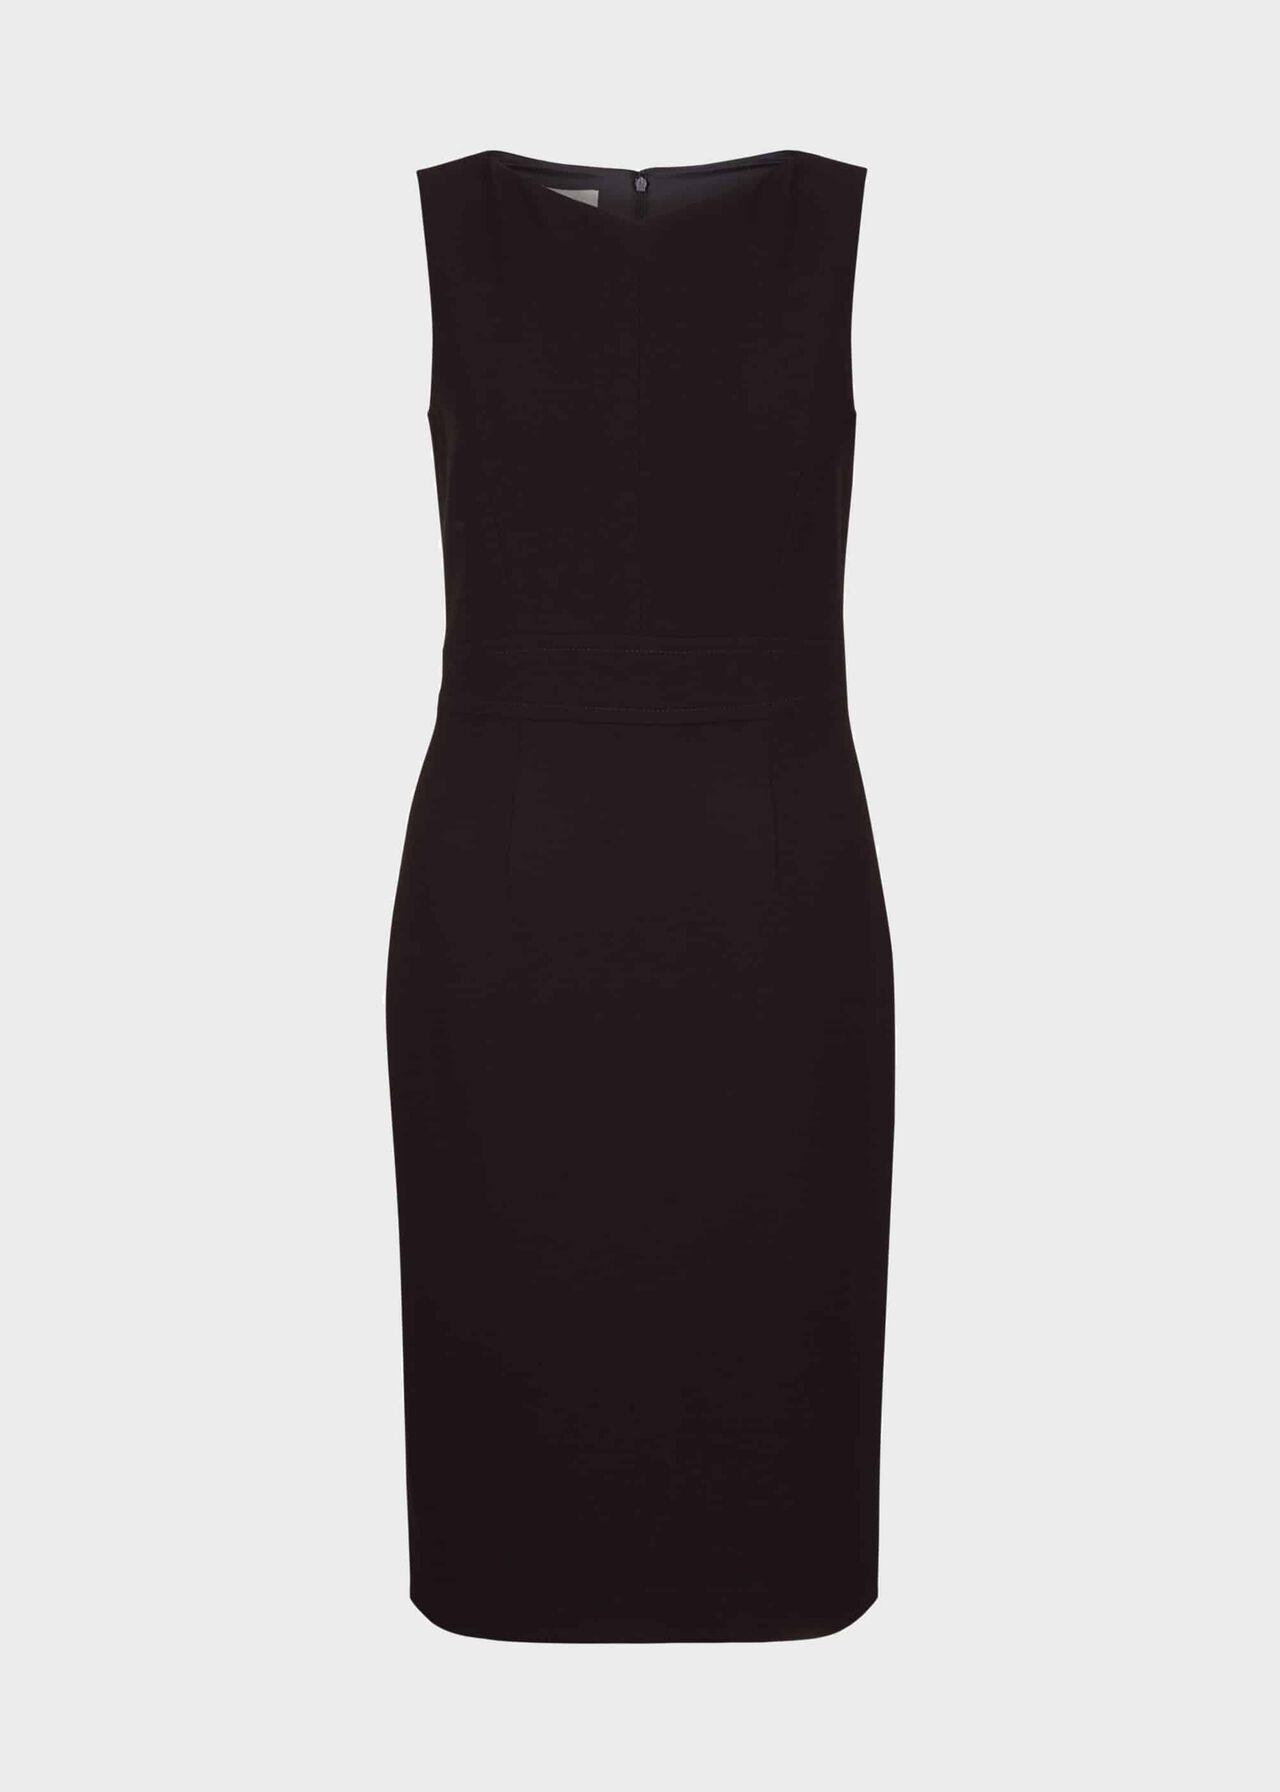 Petite Anne Dress Black